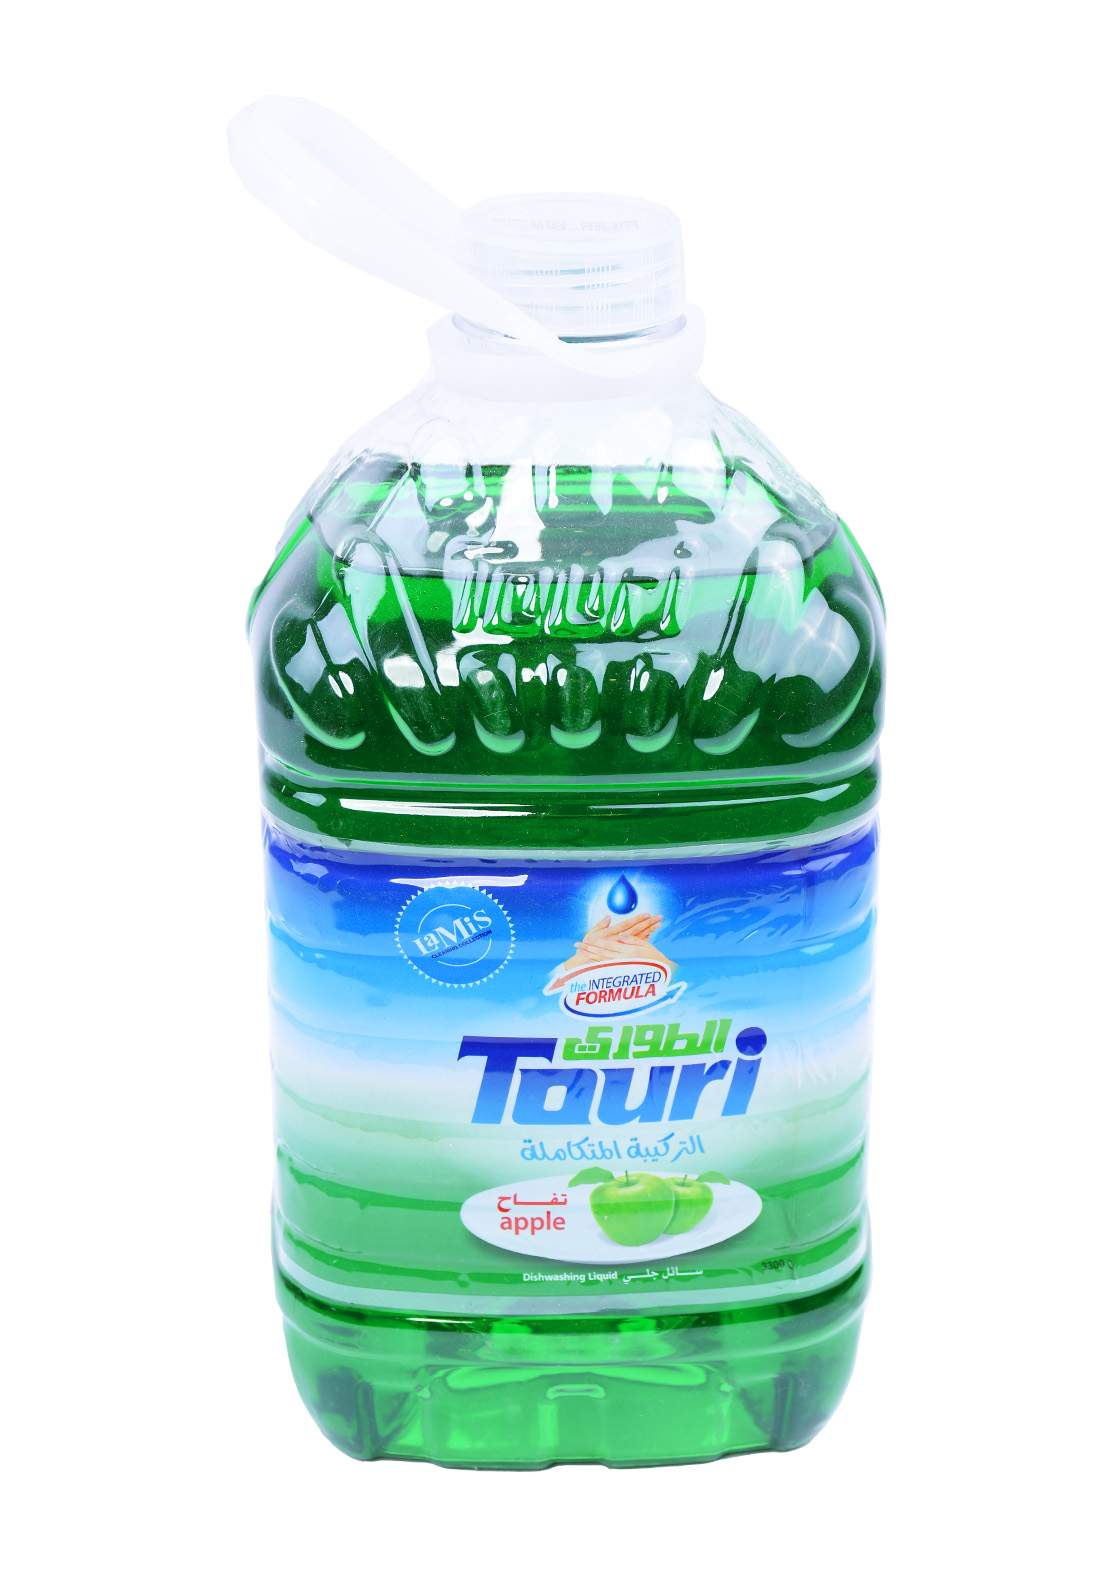 Touri Dishwashing Liquid Apple 4000 ml سائل غسيل الصحون برائحة التفاح